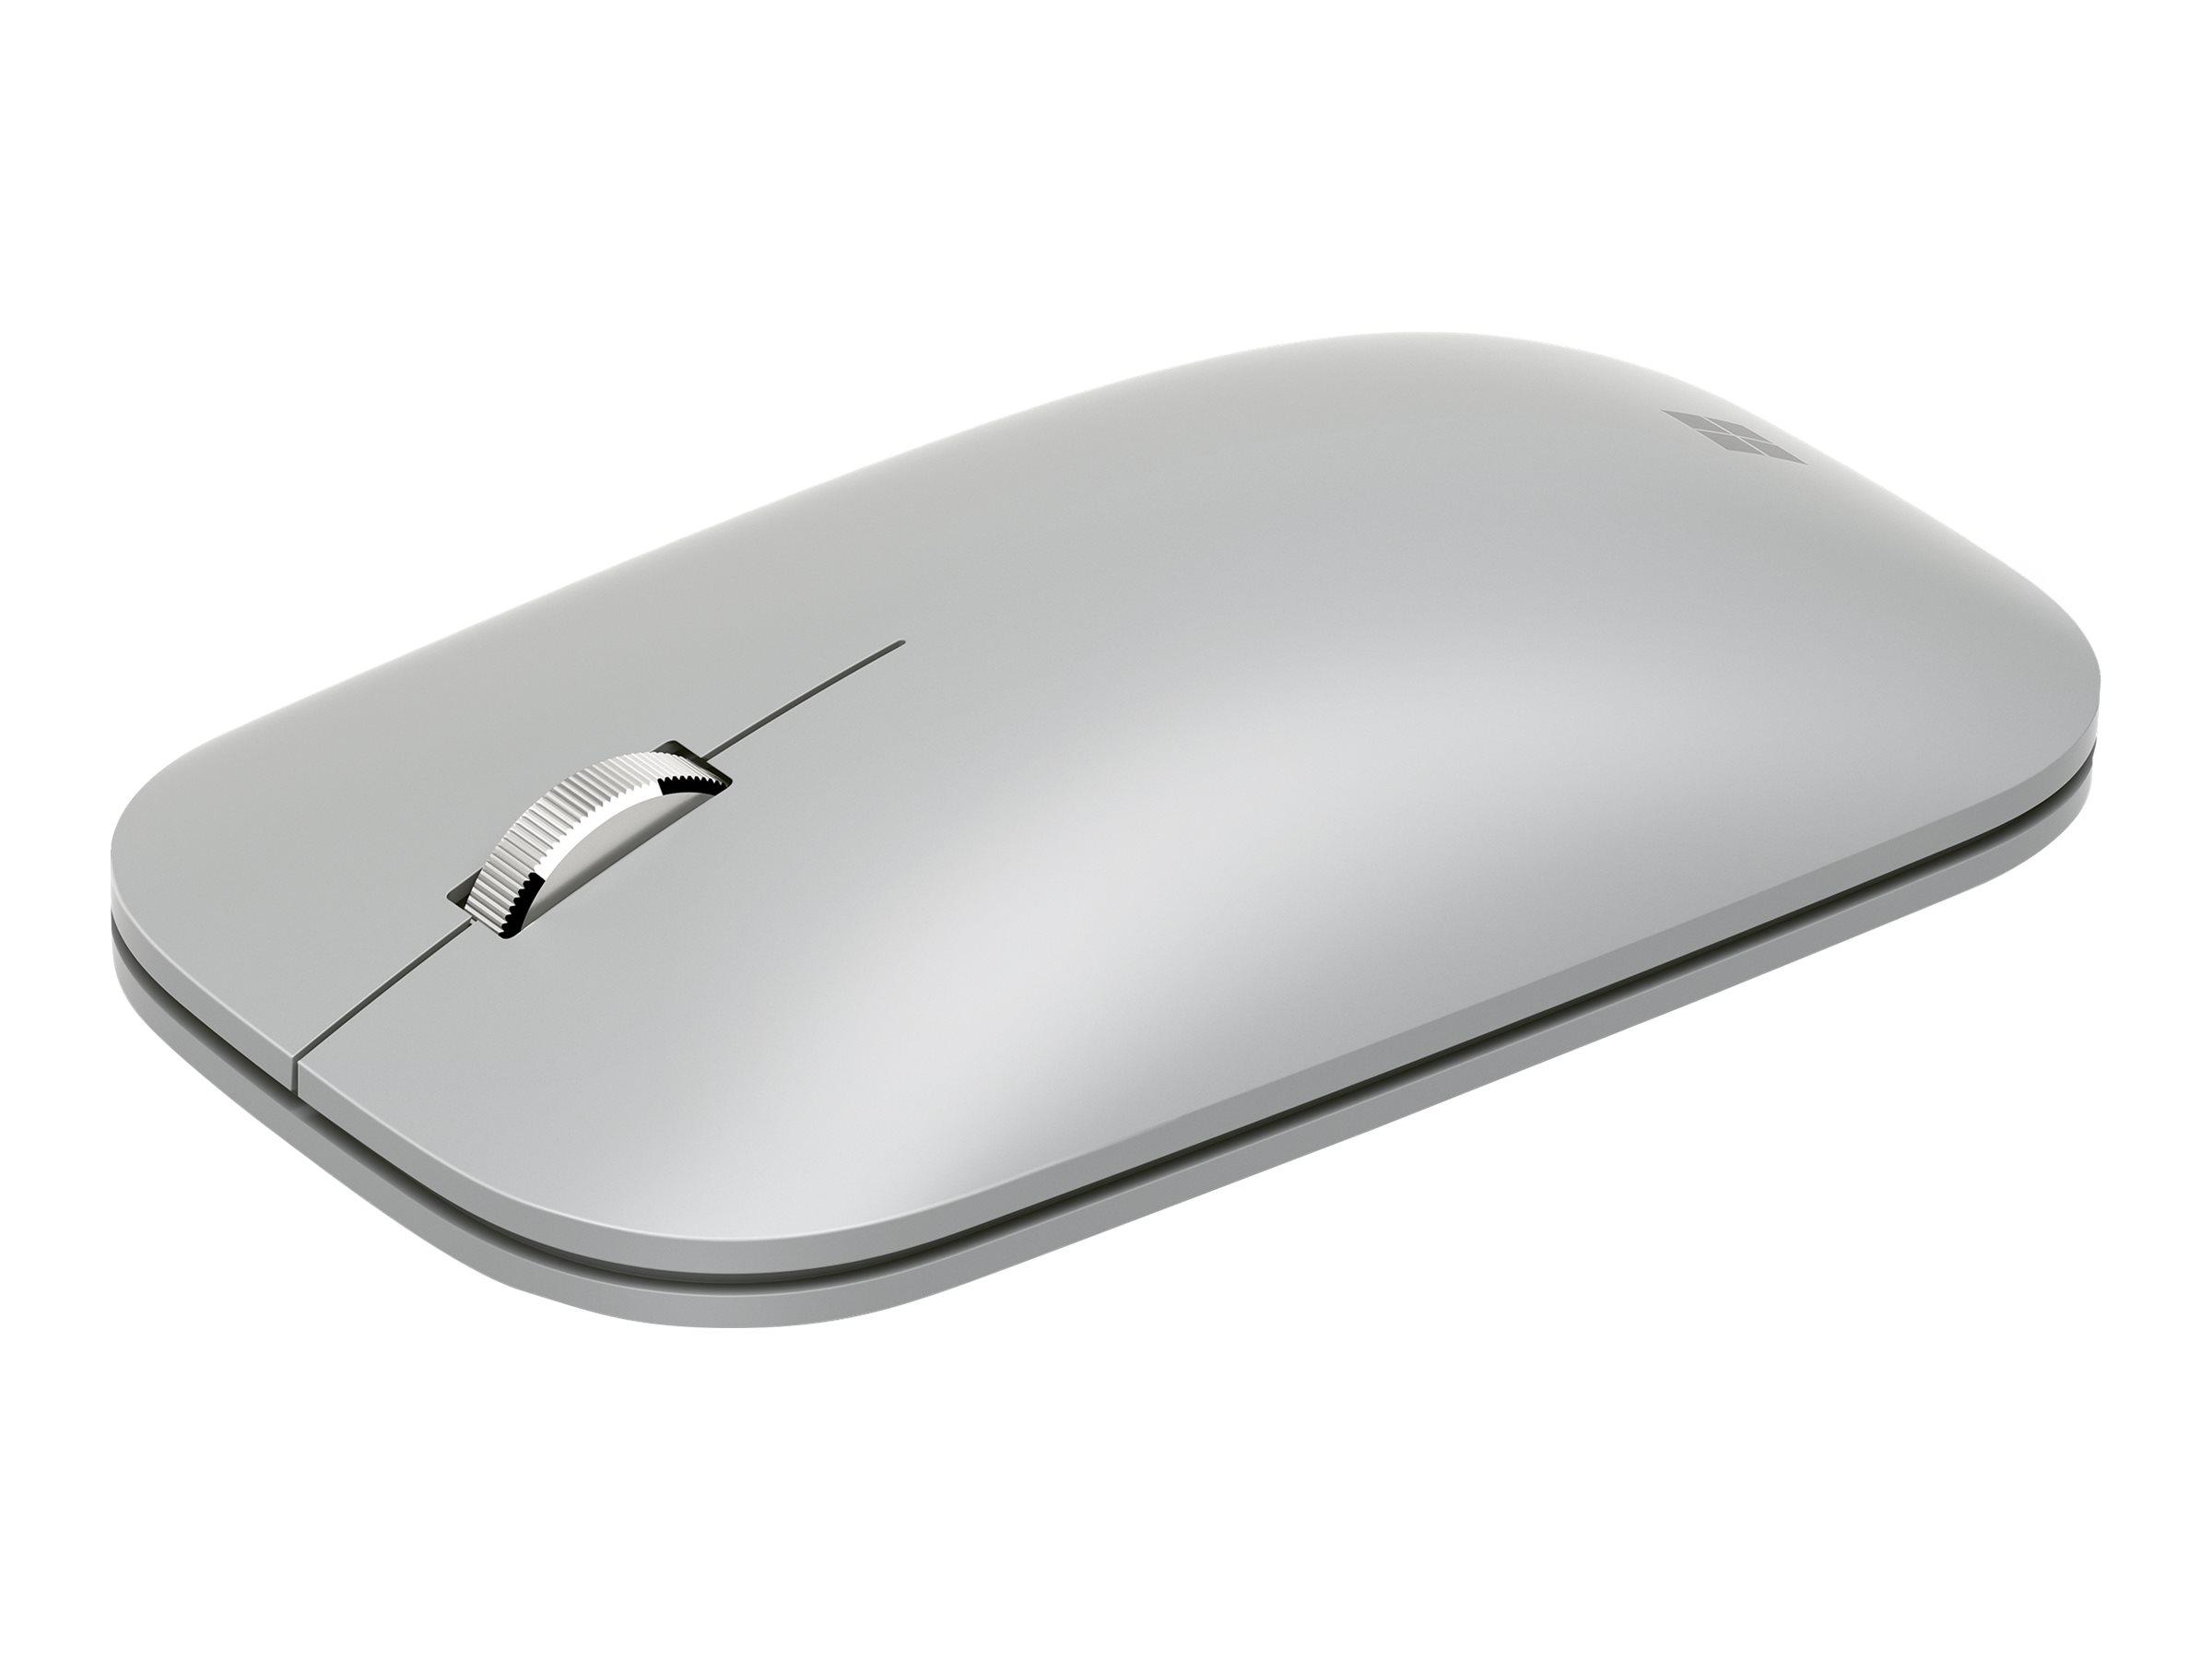 Surface mobile mouse maus optisch 3 tasten kabellos bluetooth 4 2 9323483 kgz 00002